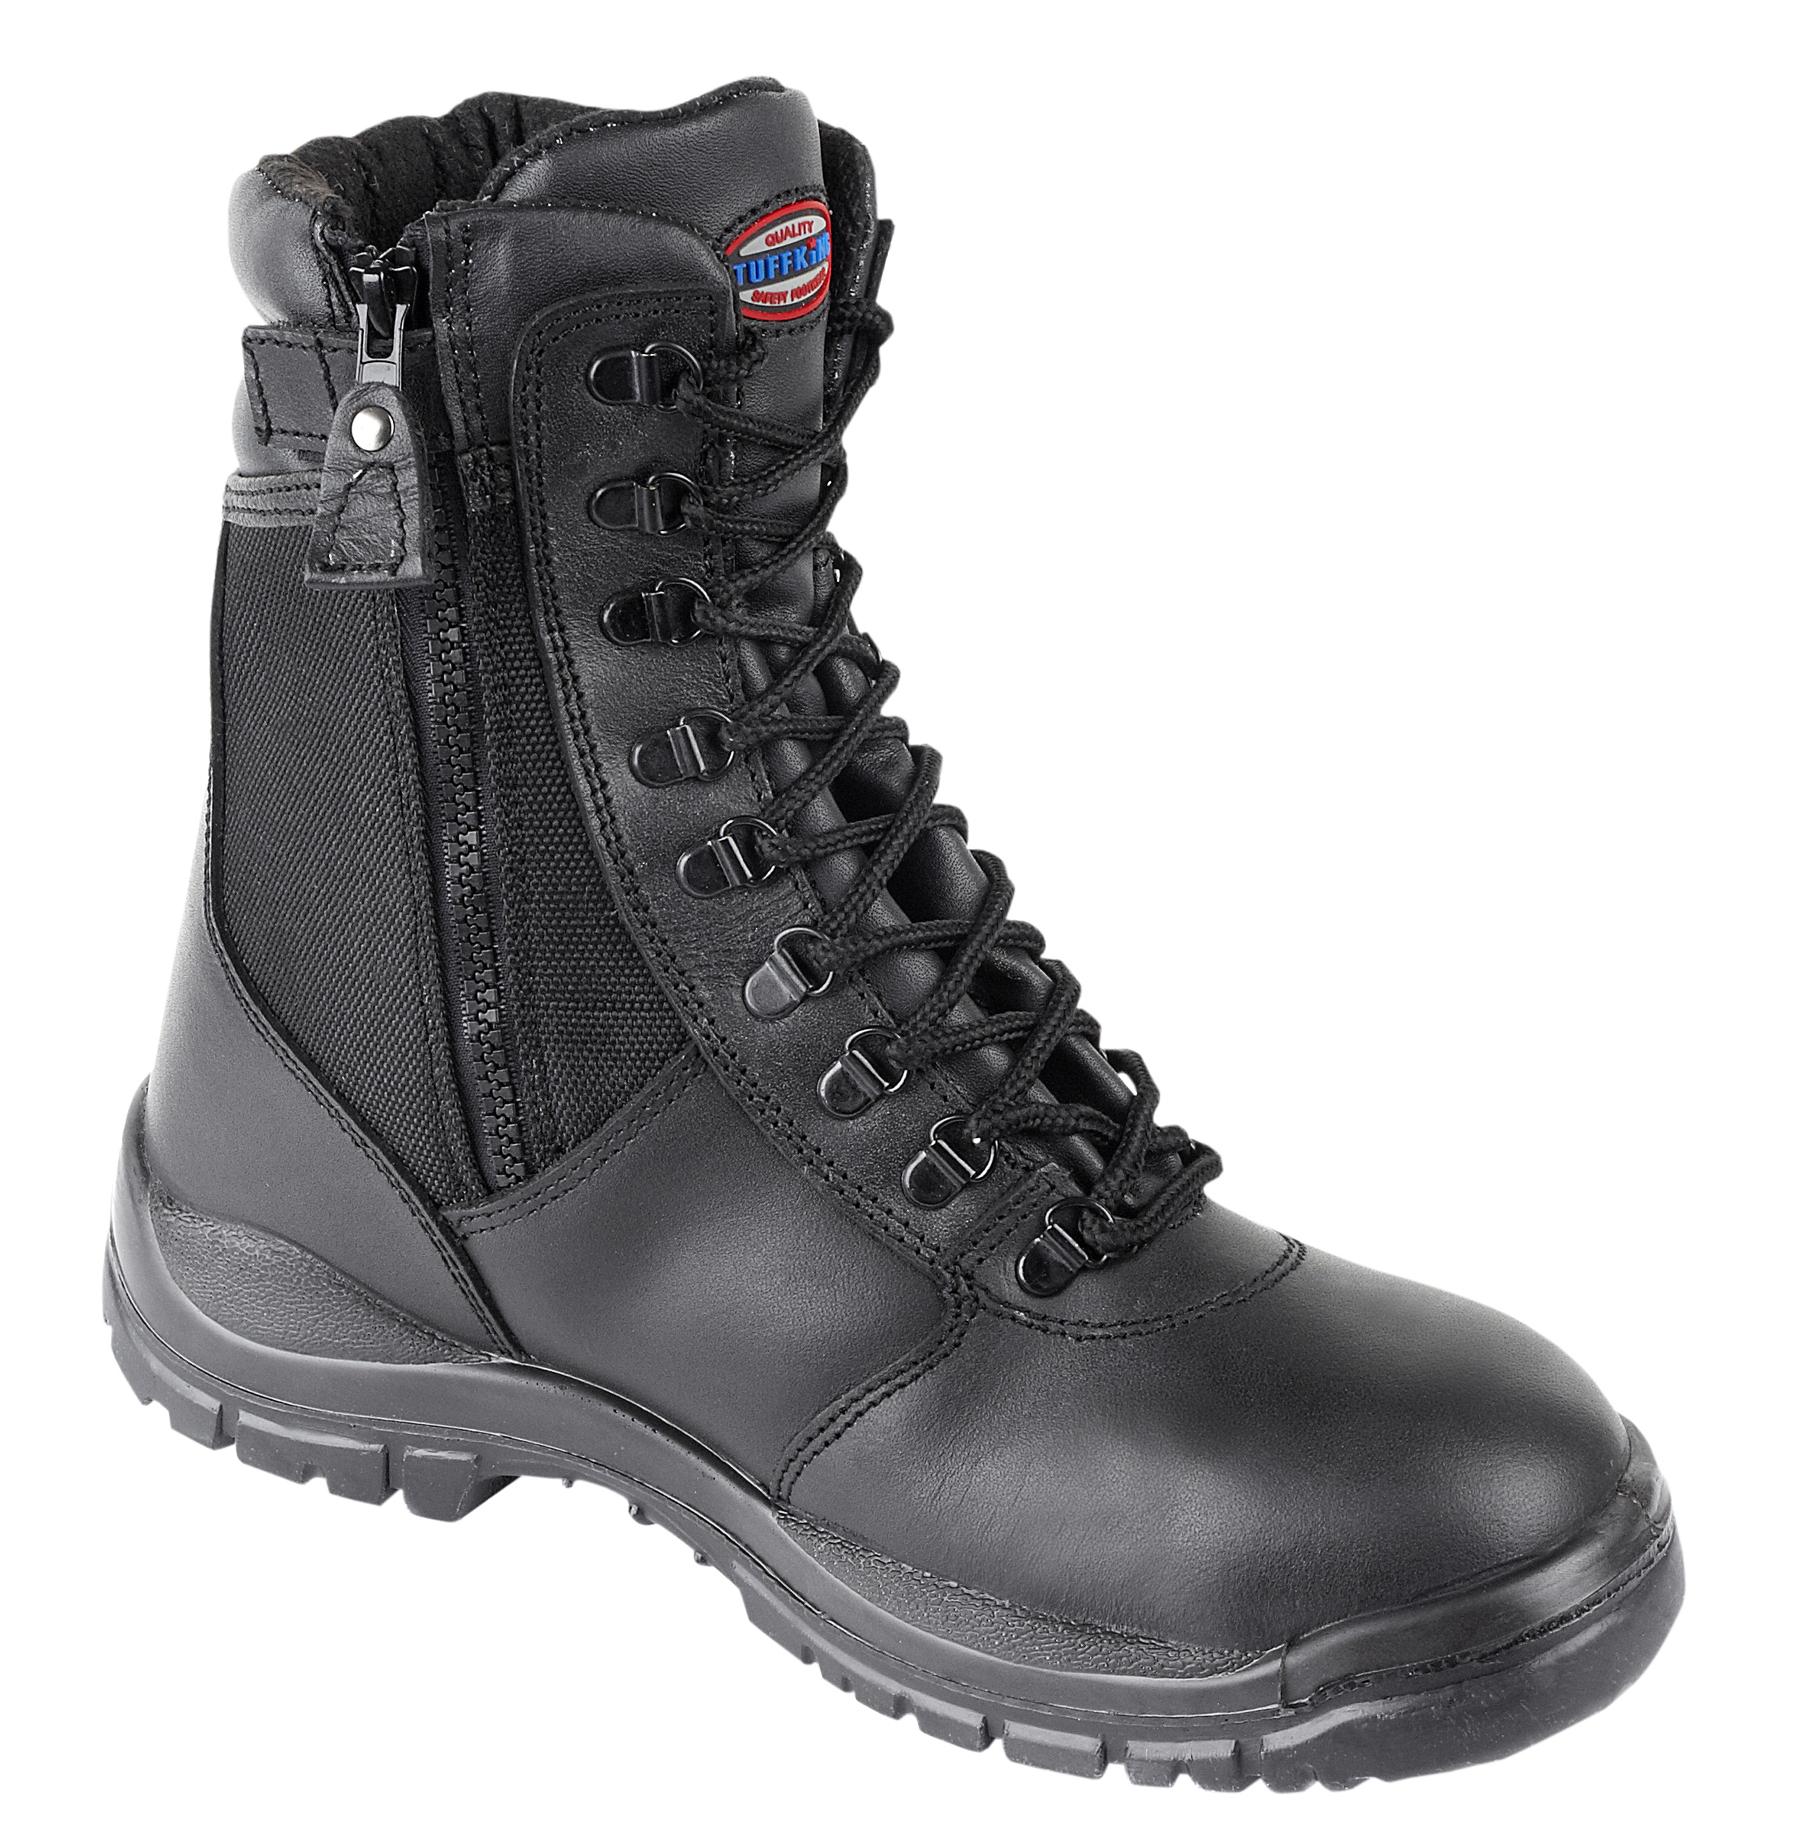 Tuffking Black High Leg Boot 9108